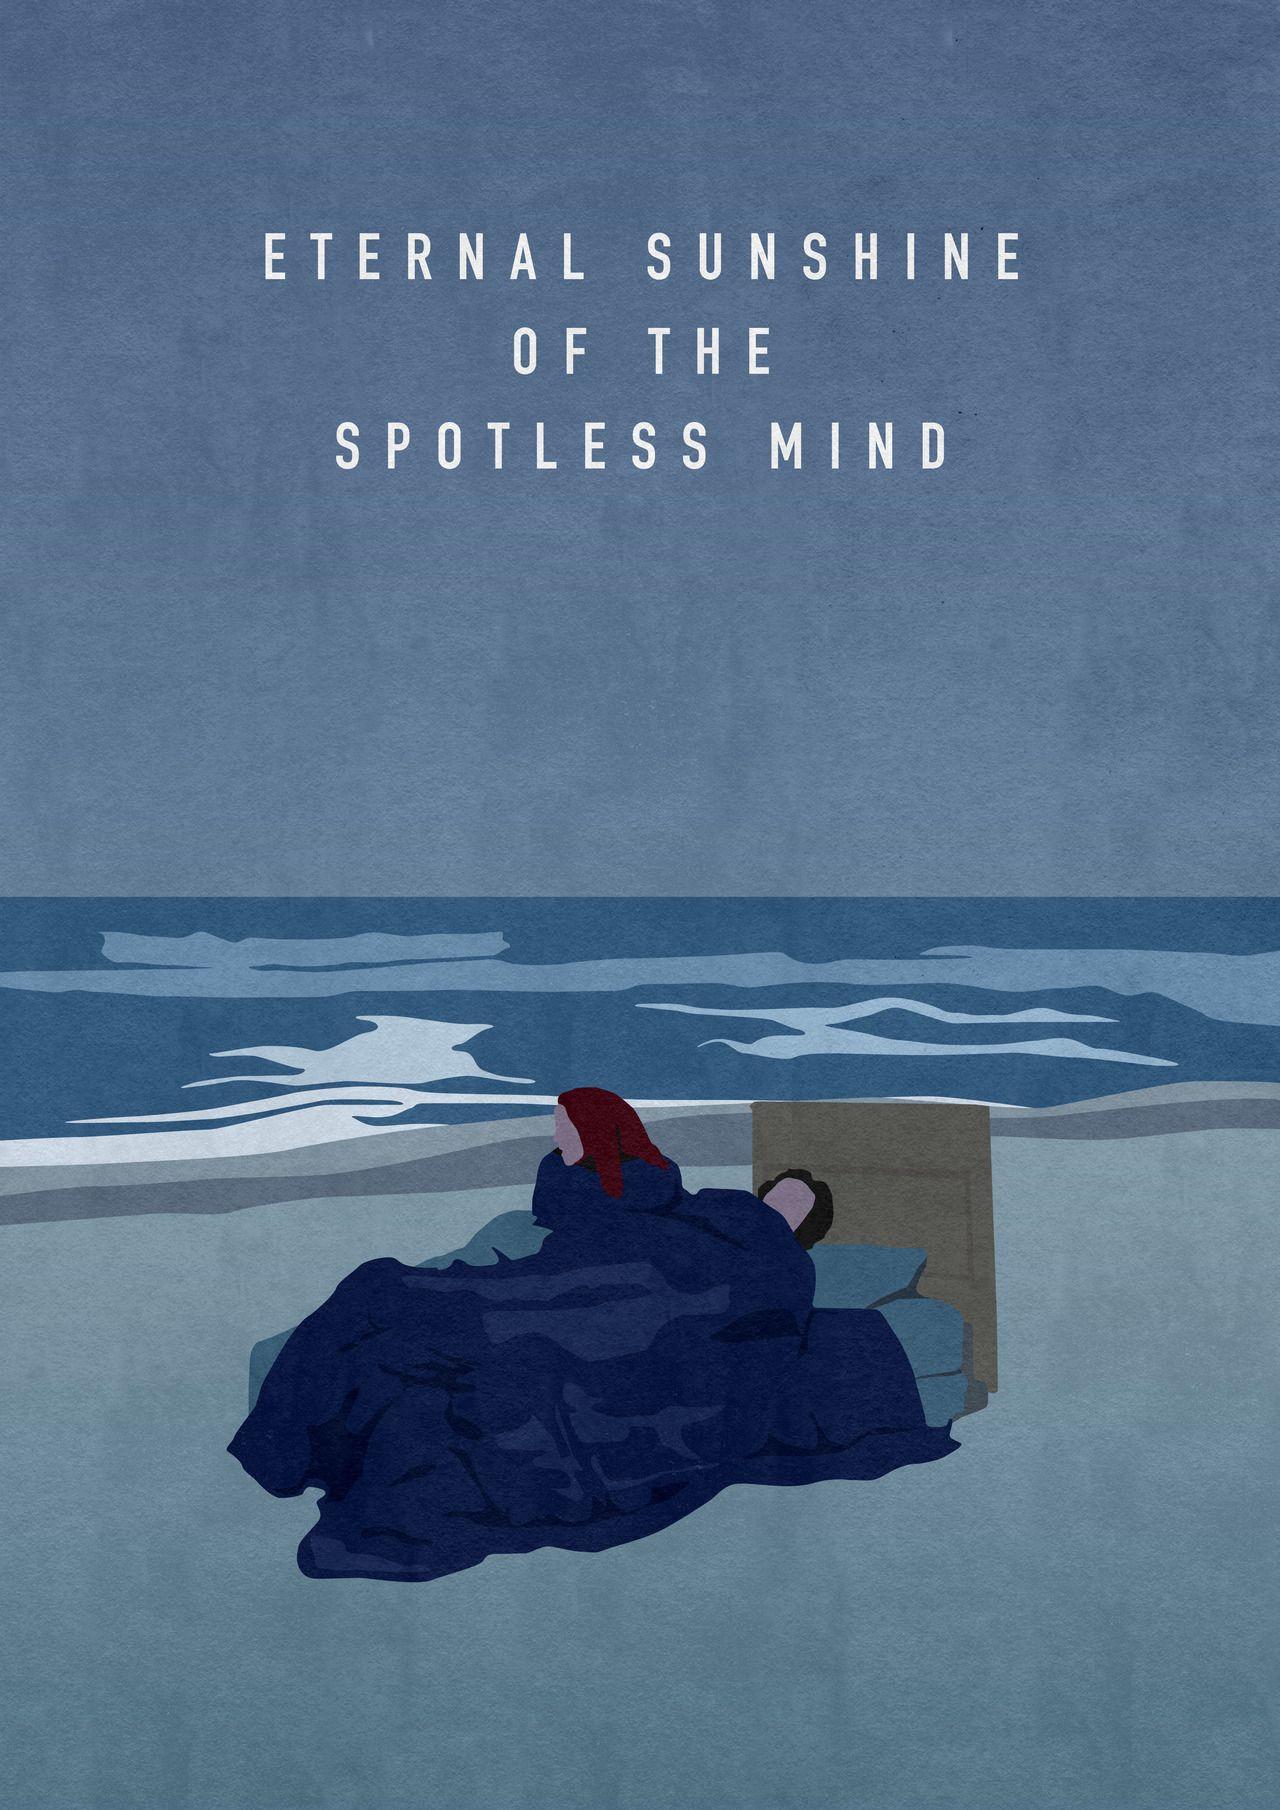 Eternal Sunshine of the Spotless Mind (2004) Hindi Dubbed